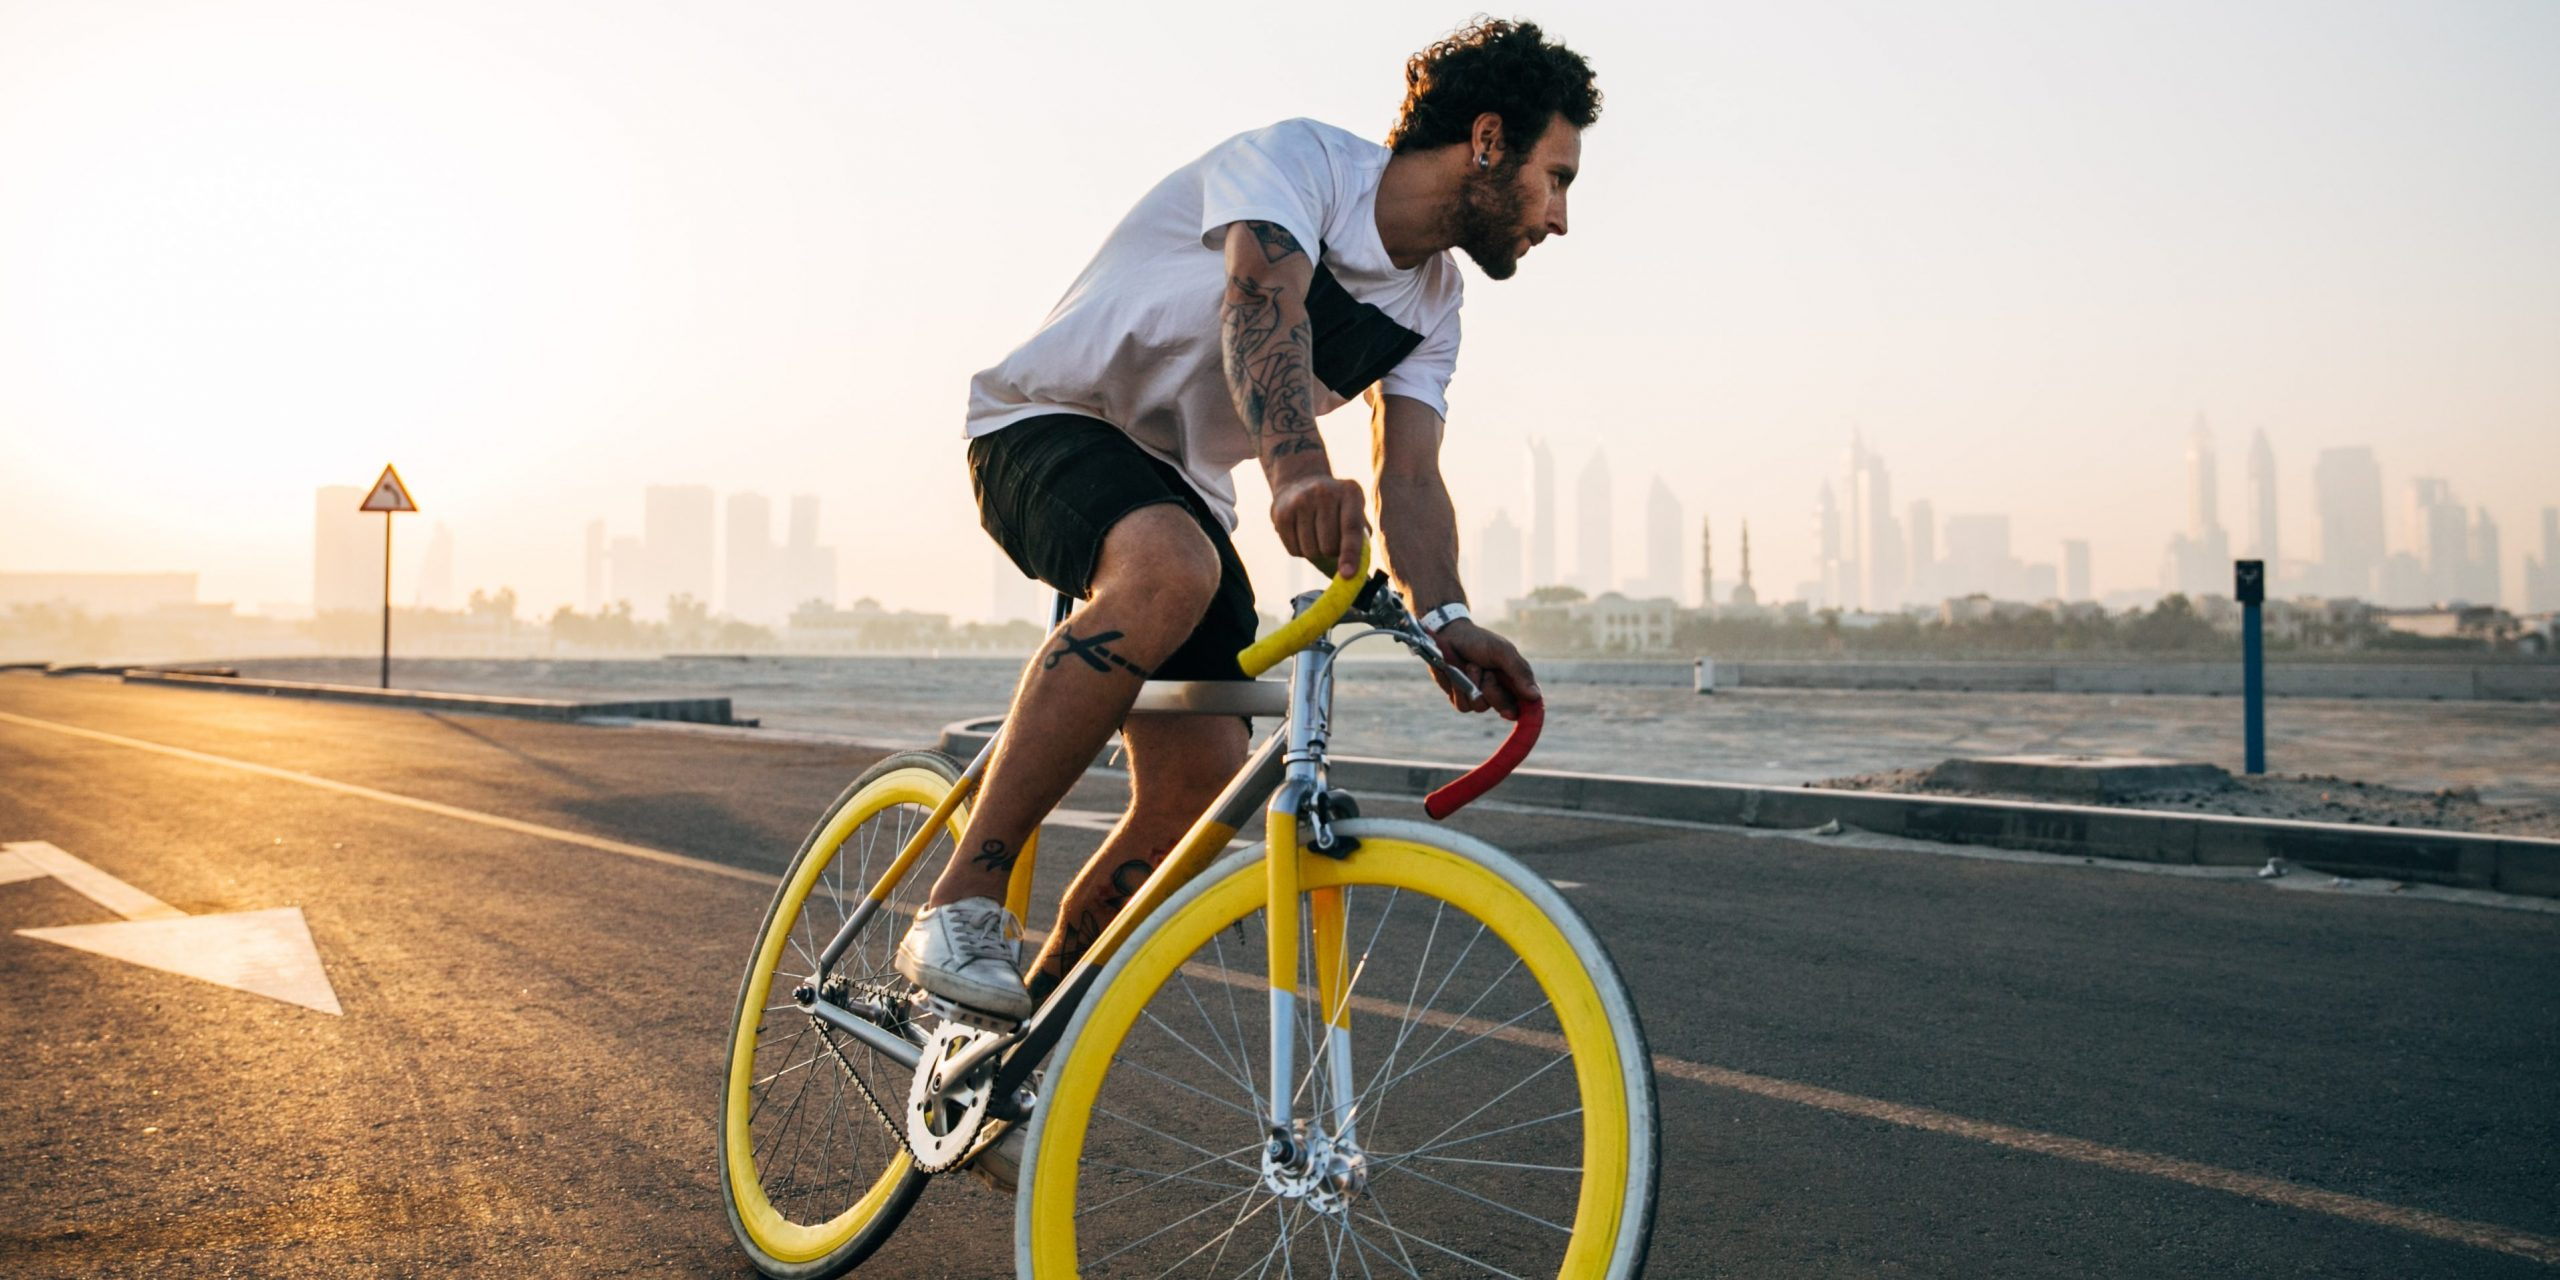 МТС подключила к сети NB-IoT сервис проката велосипедов и электросамокатов